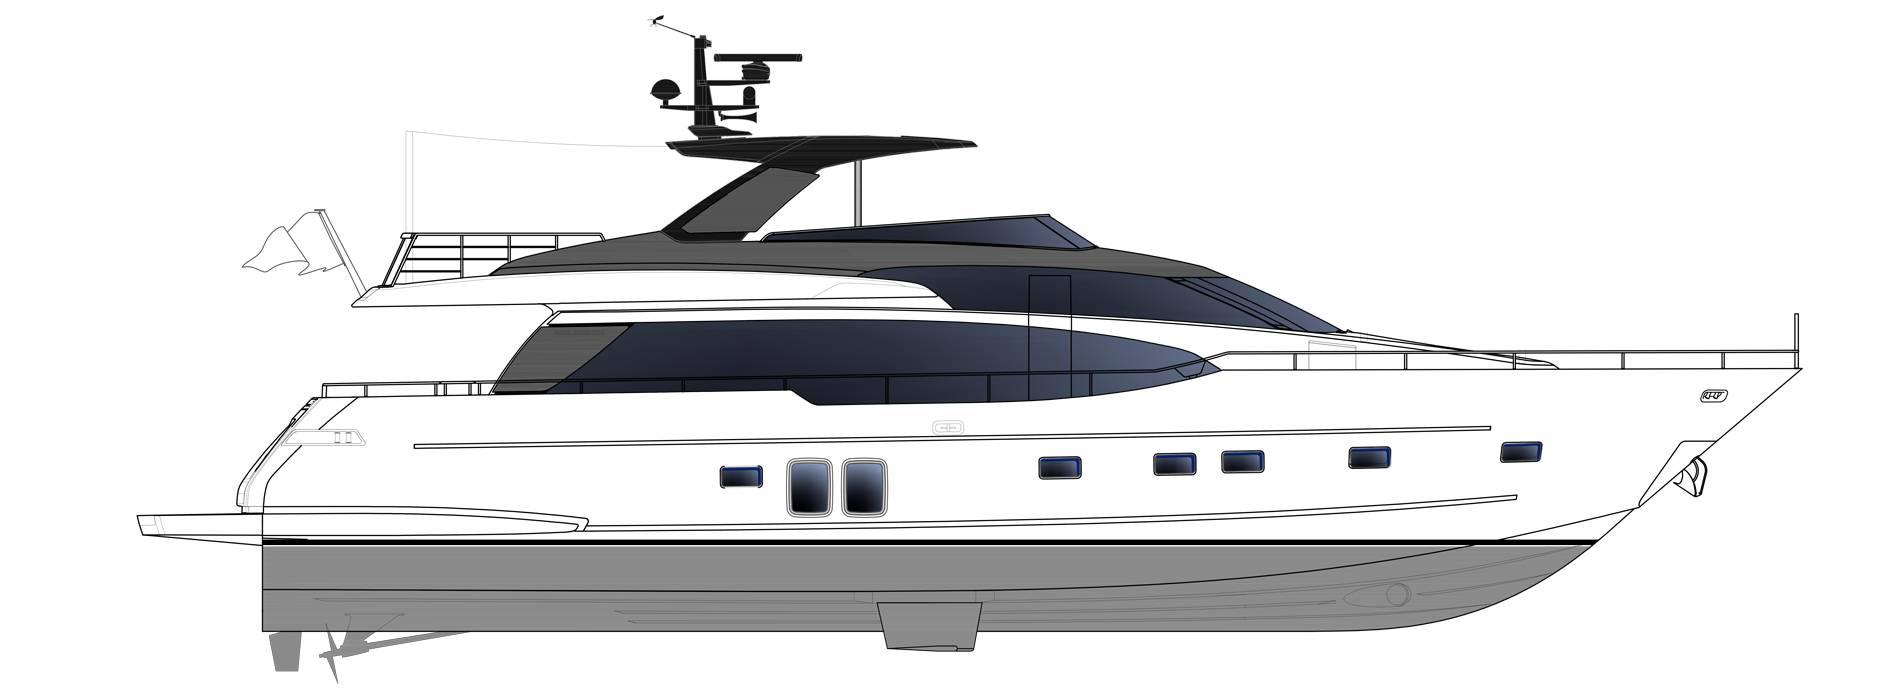 Sanlorenzo Yachts SL78-695 Профиль